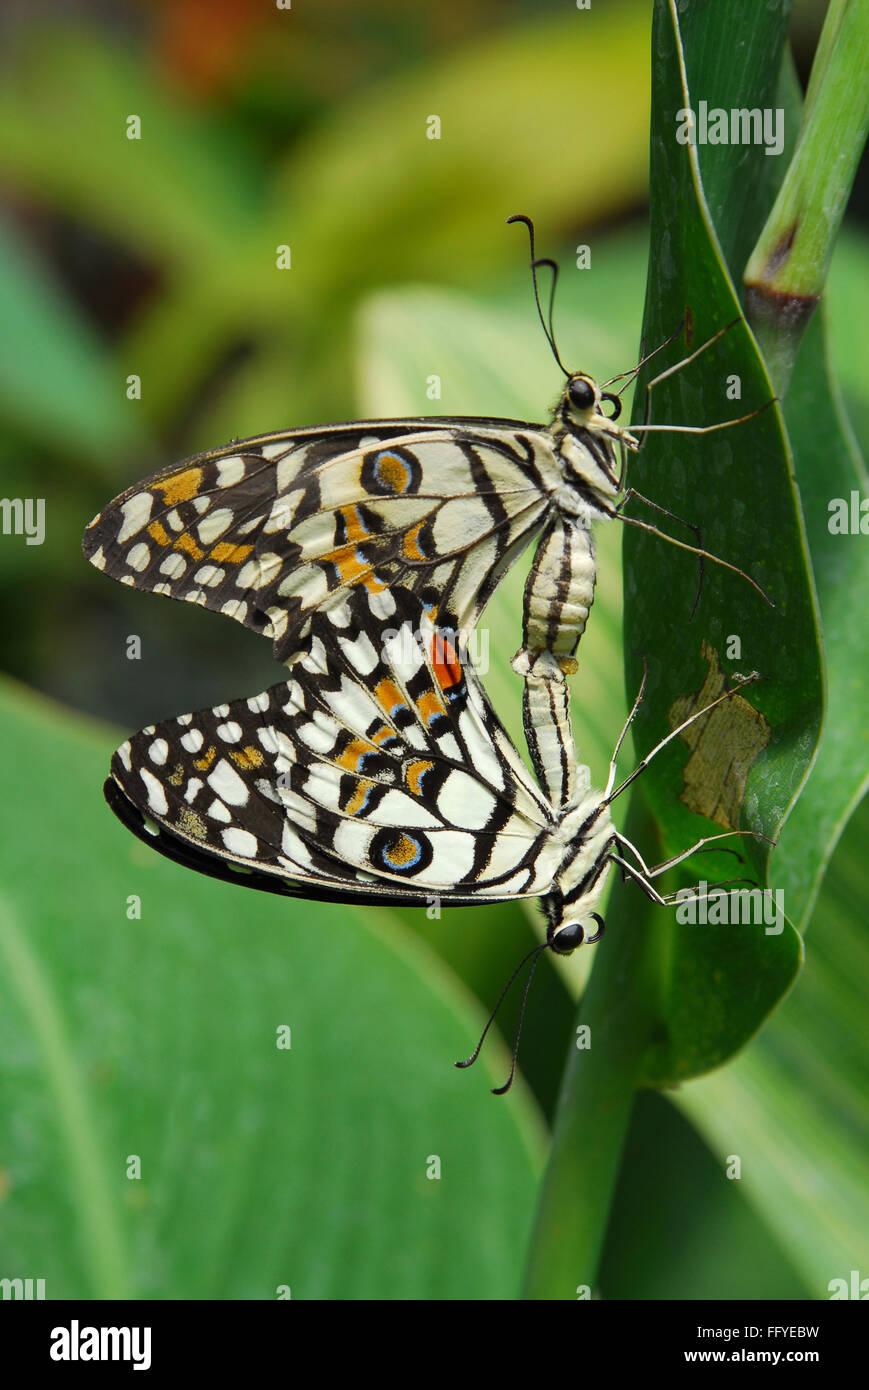 Lime el apareamiento de mariposas Butterfly park Bannerghatta en Bangalore en Karnataka, India Asia Imagen De Stock